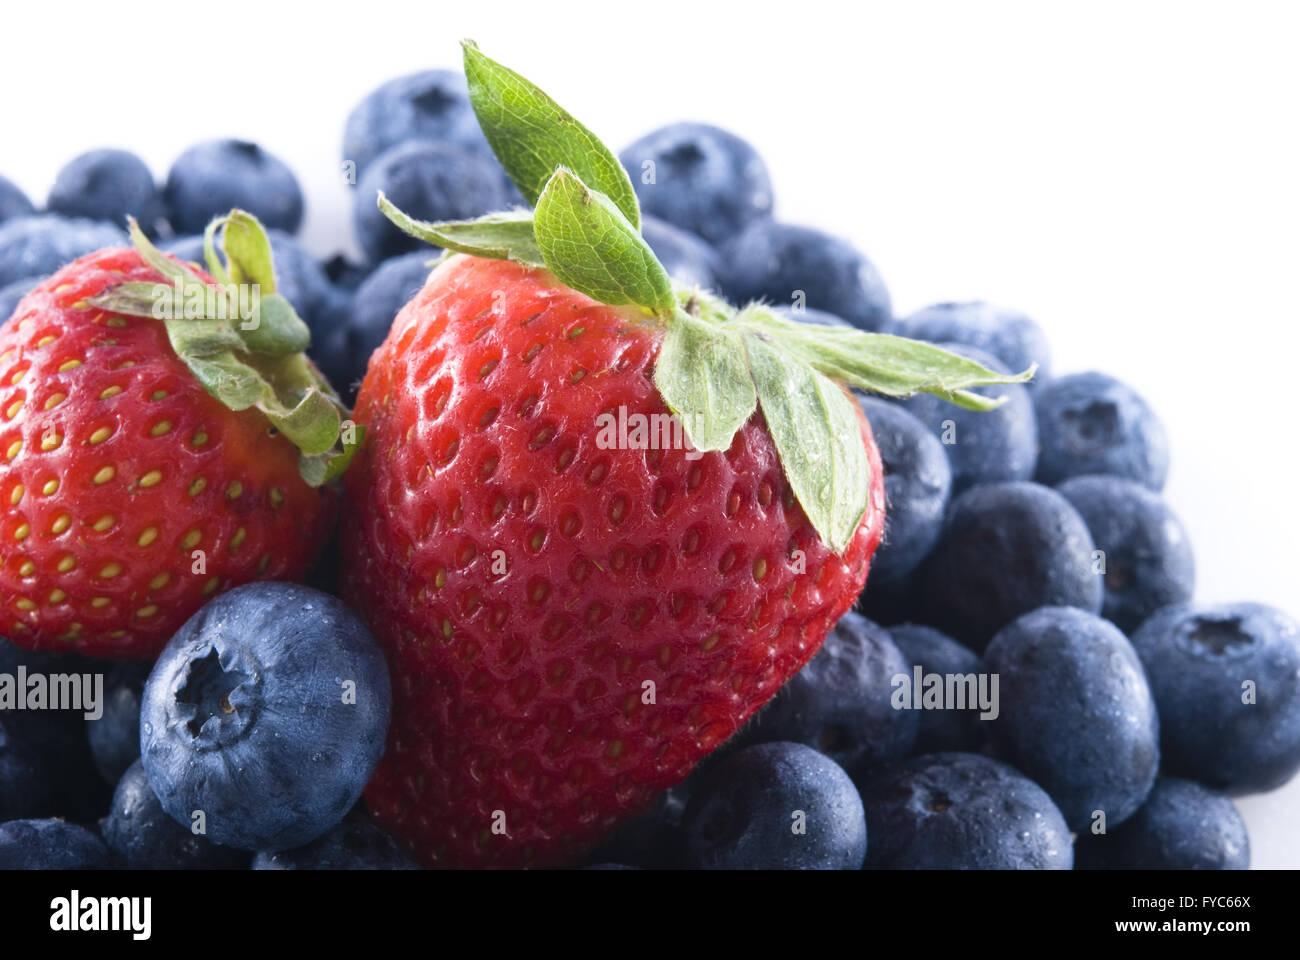 Mixed berries - Stock Image